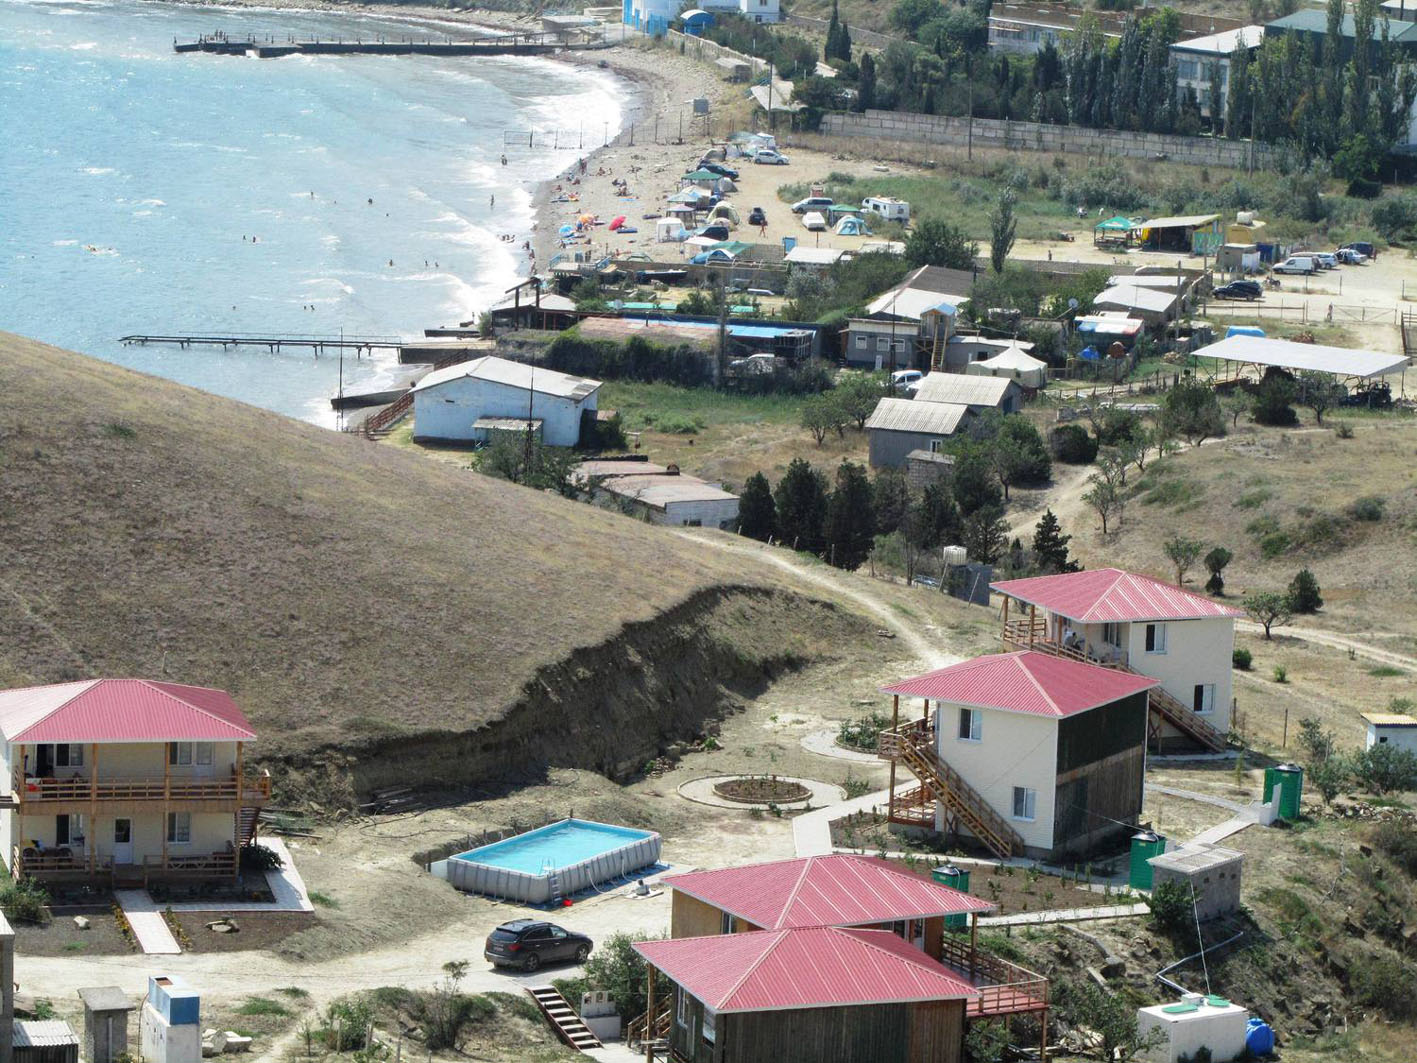 Krim solne4naja dolina  bereg prodaza kvartir